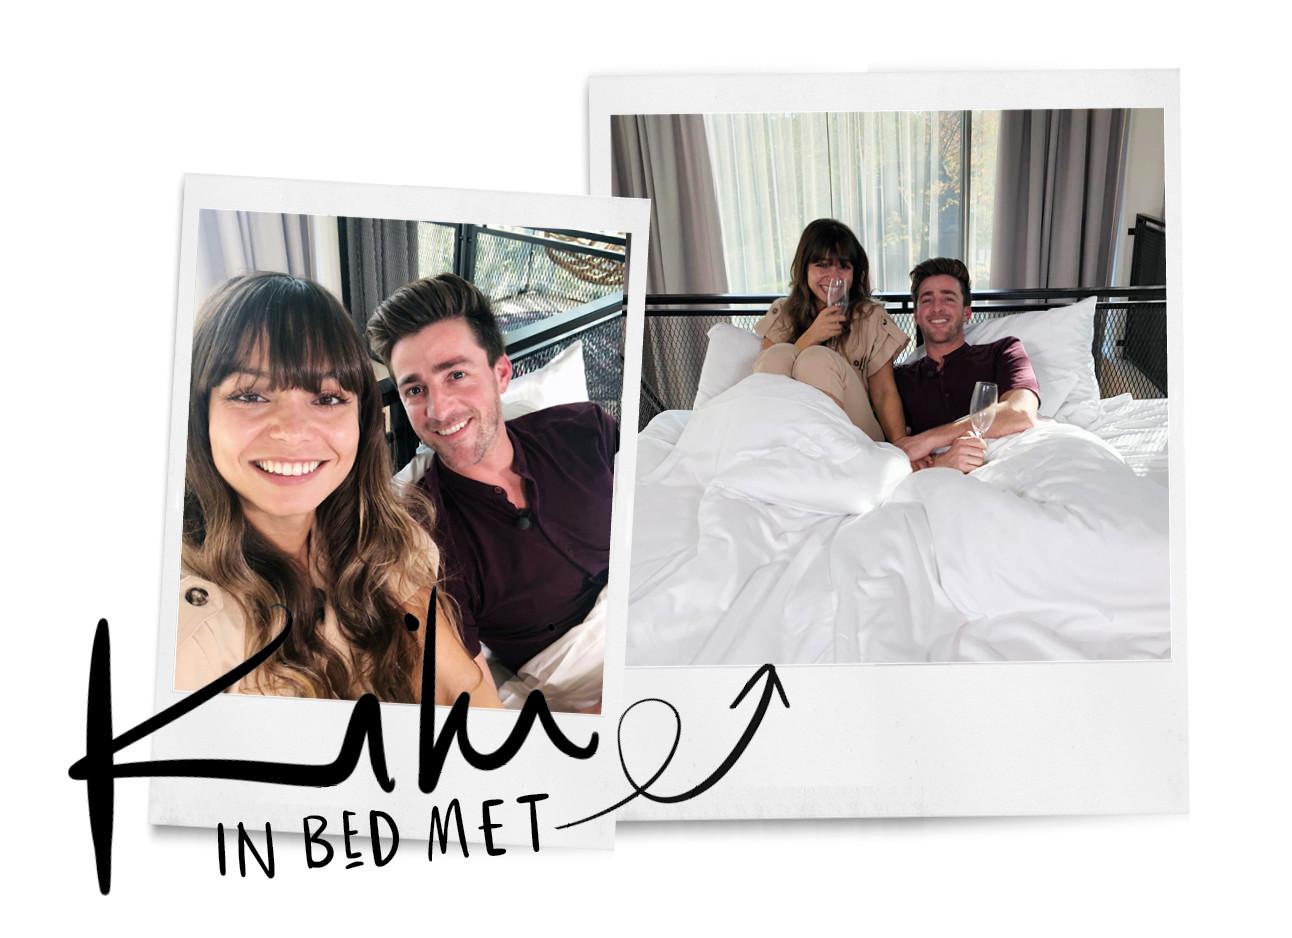 in bed met kiki en hugo kennis van expeditie robinson met champagne in hotel arena